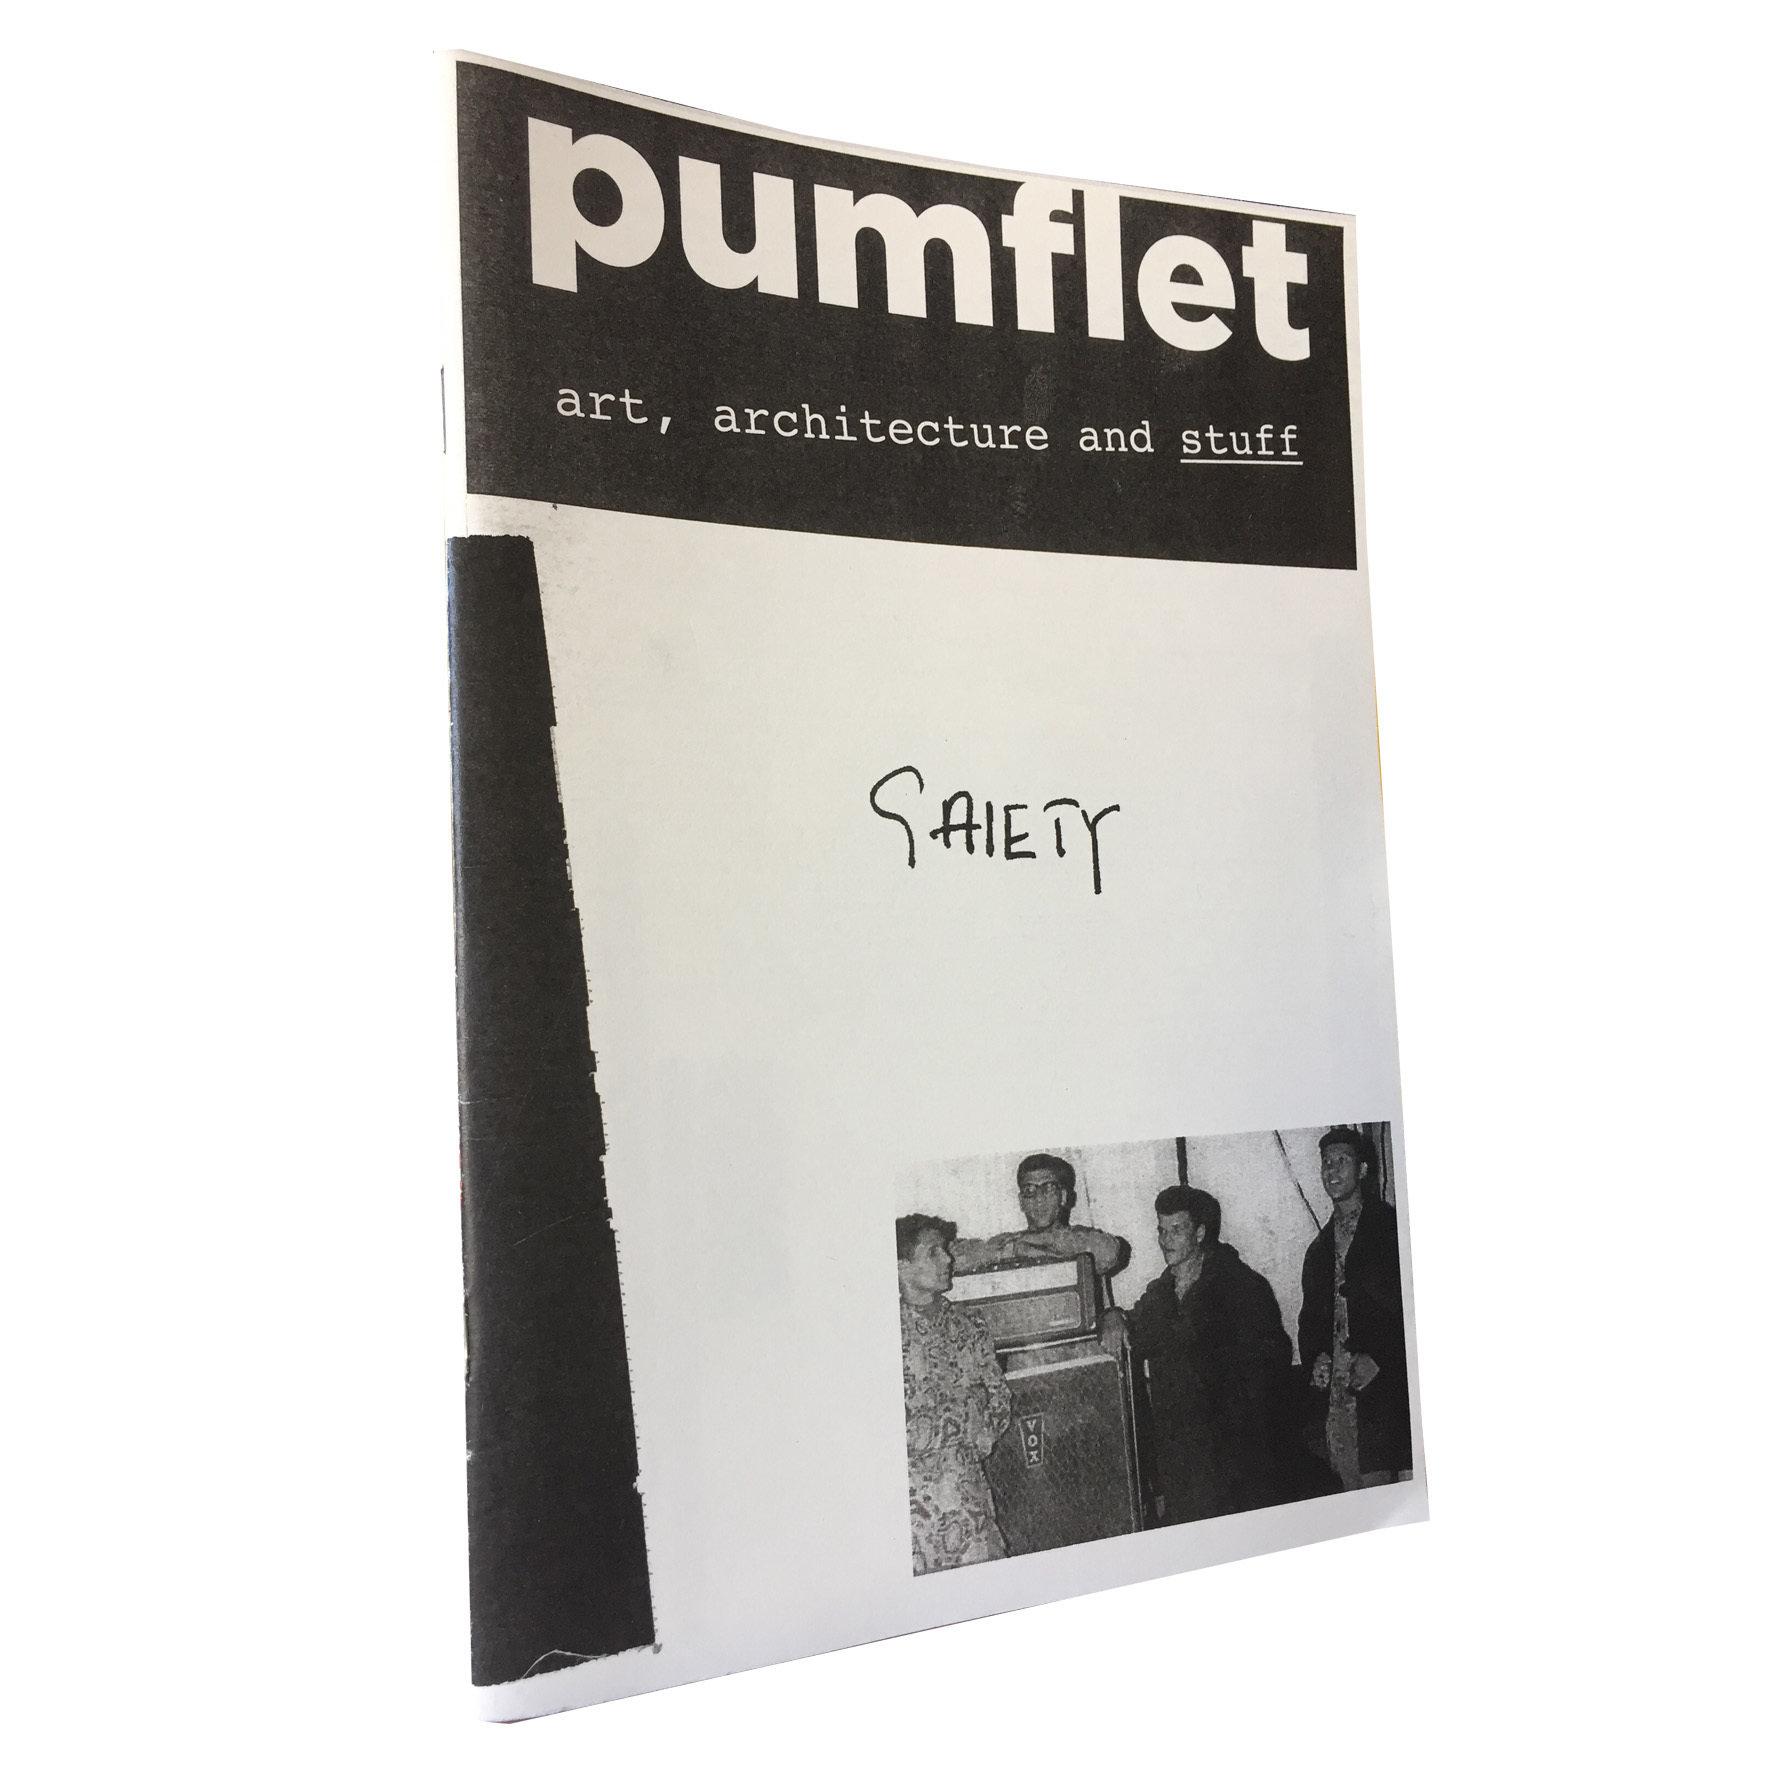 pumflet: art, architecture, and stuff - gaiety PF01